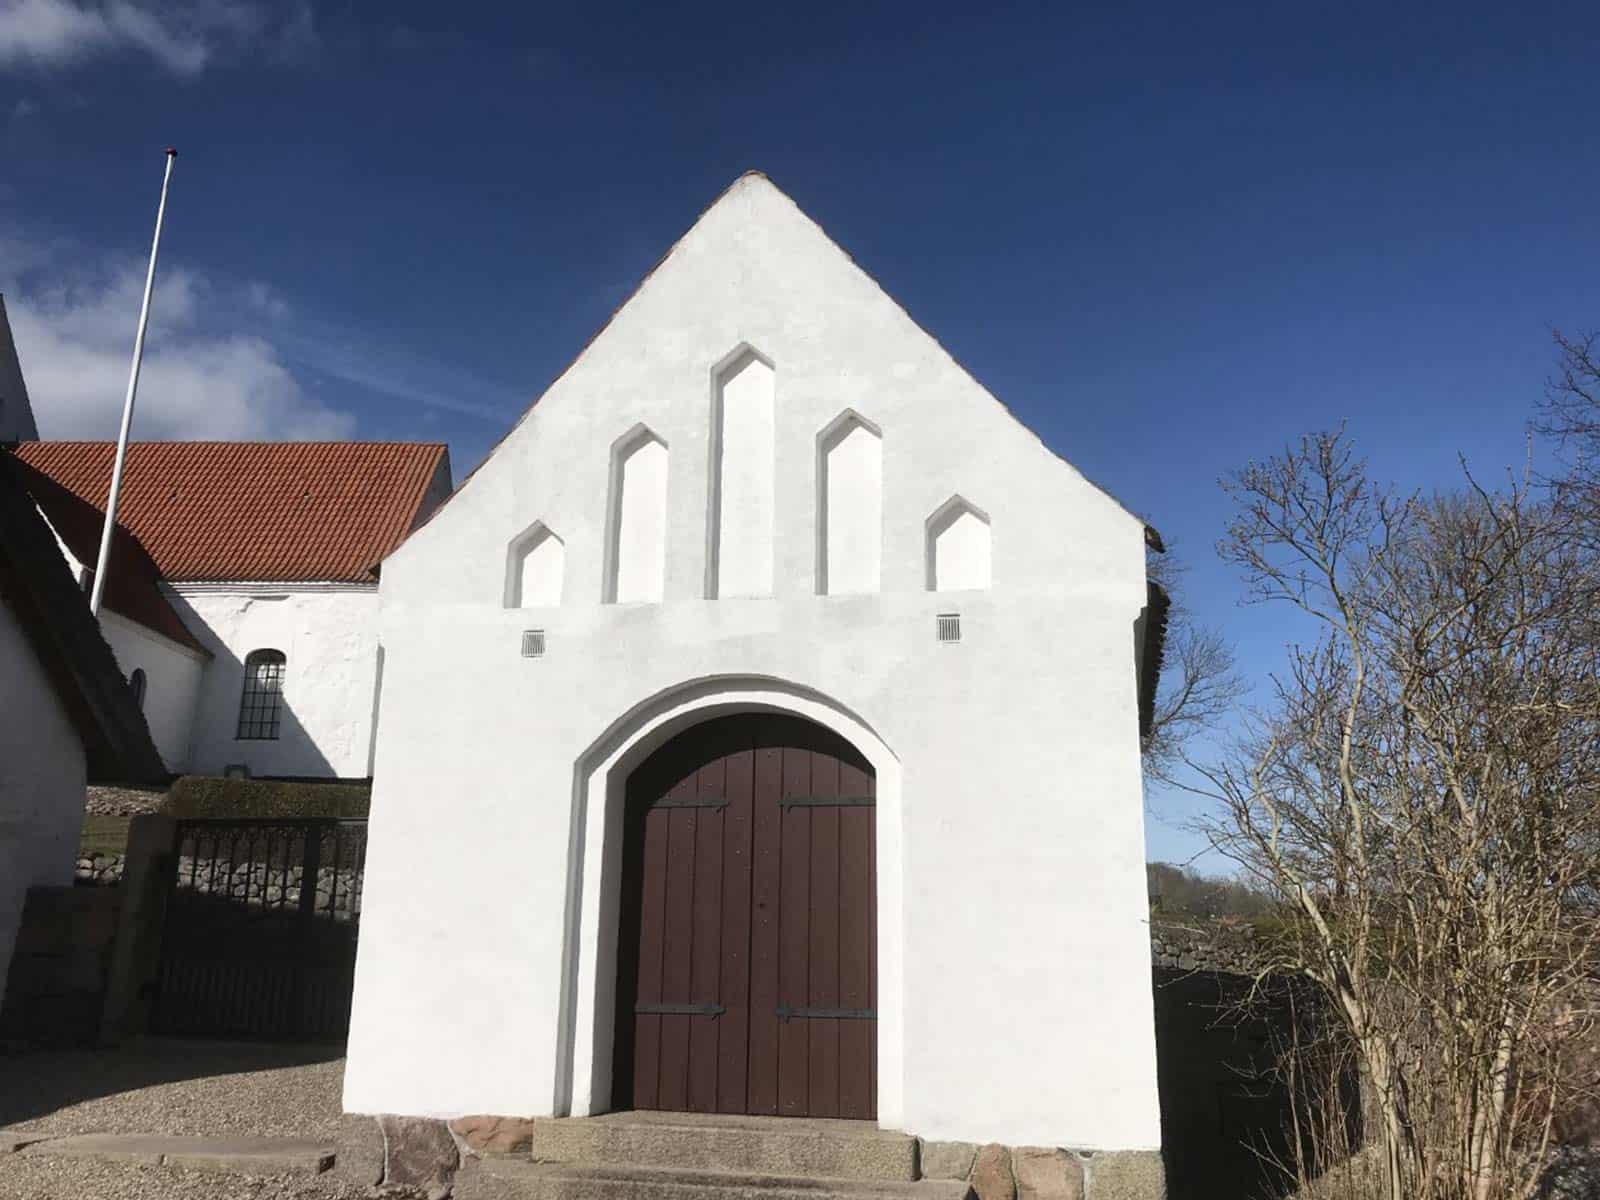 Tryggelev Kirke våbenhus